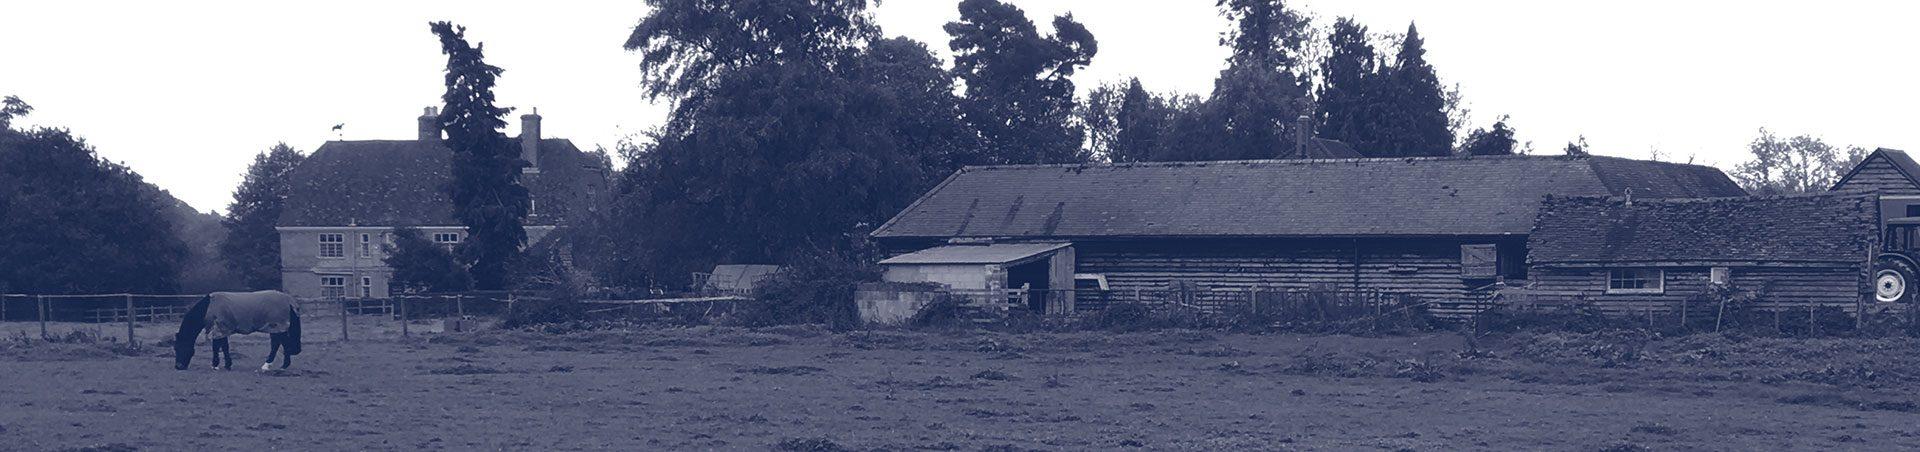 Rural passivhaus